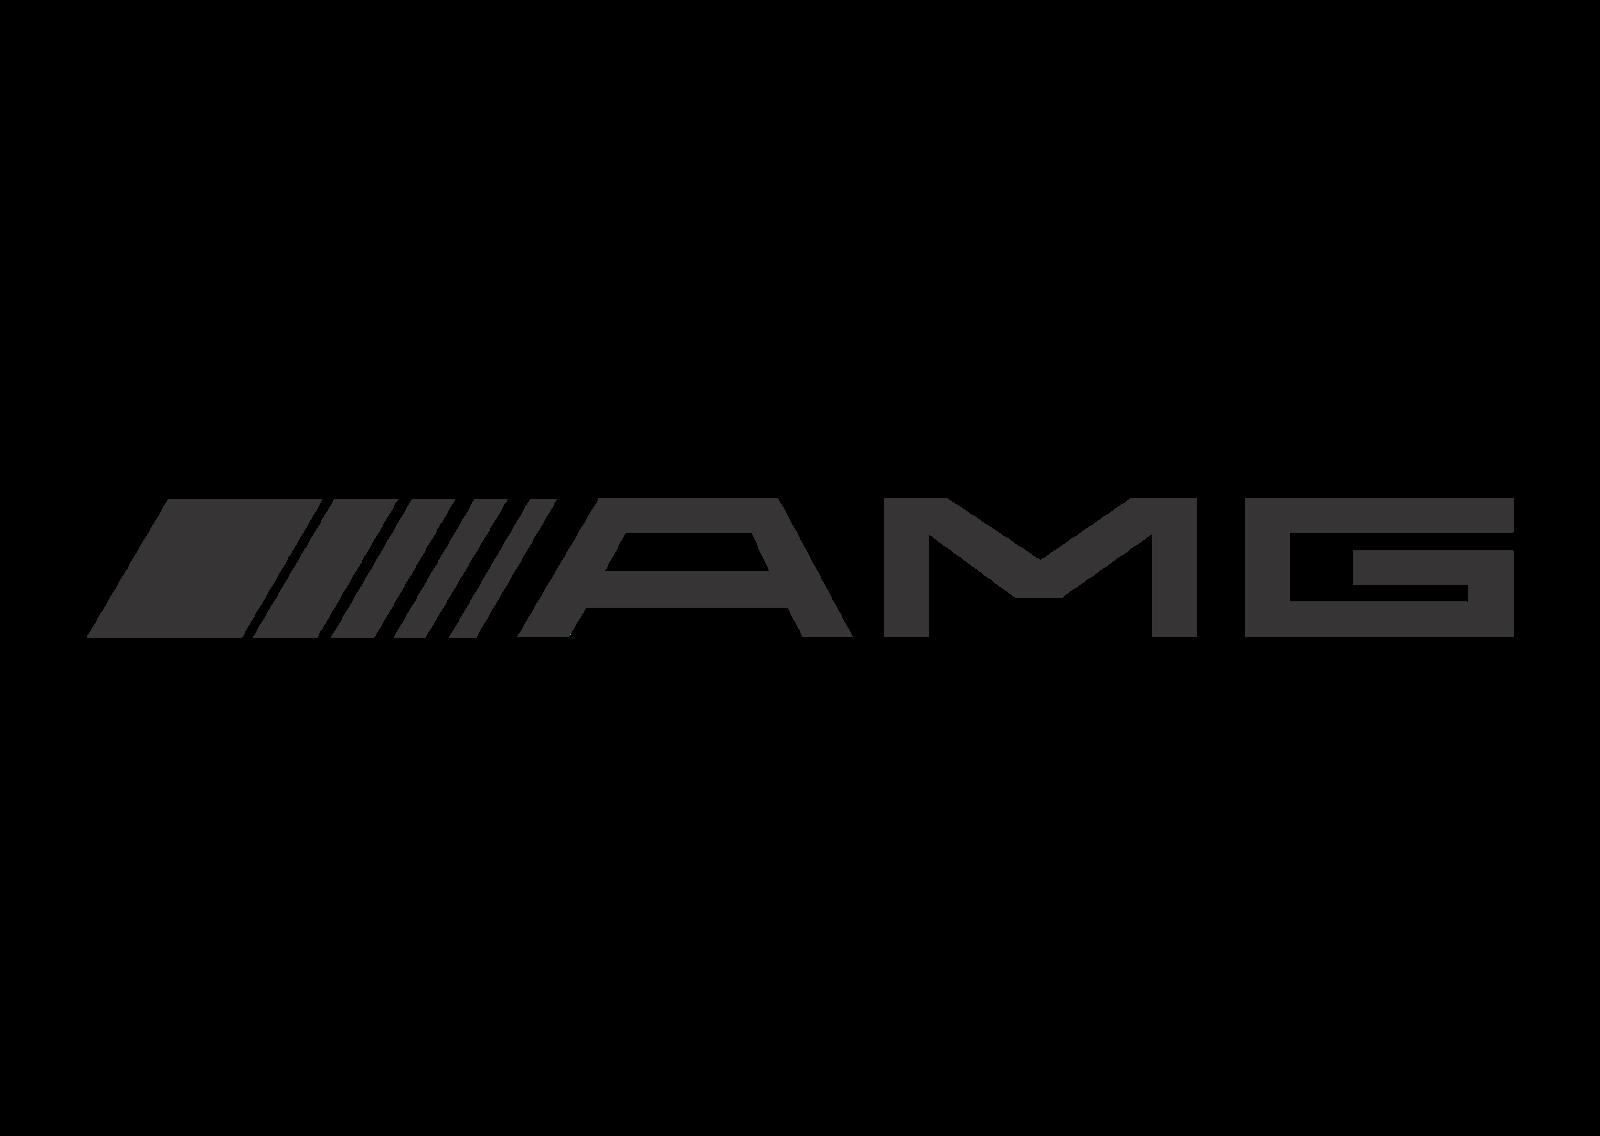 amg logo vector vector logo download pinterest cars